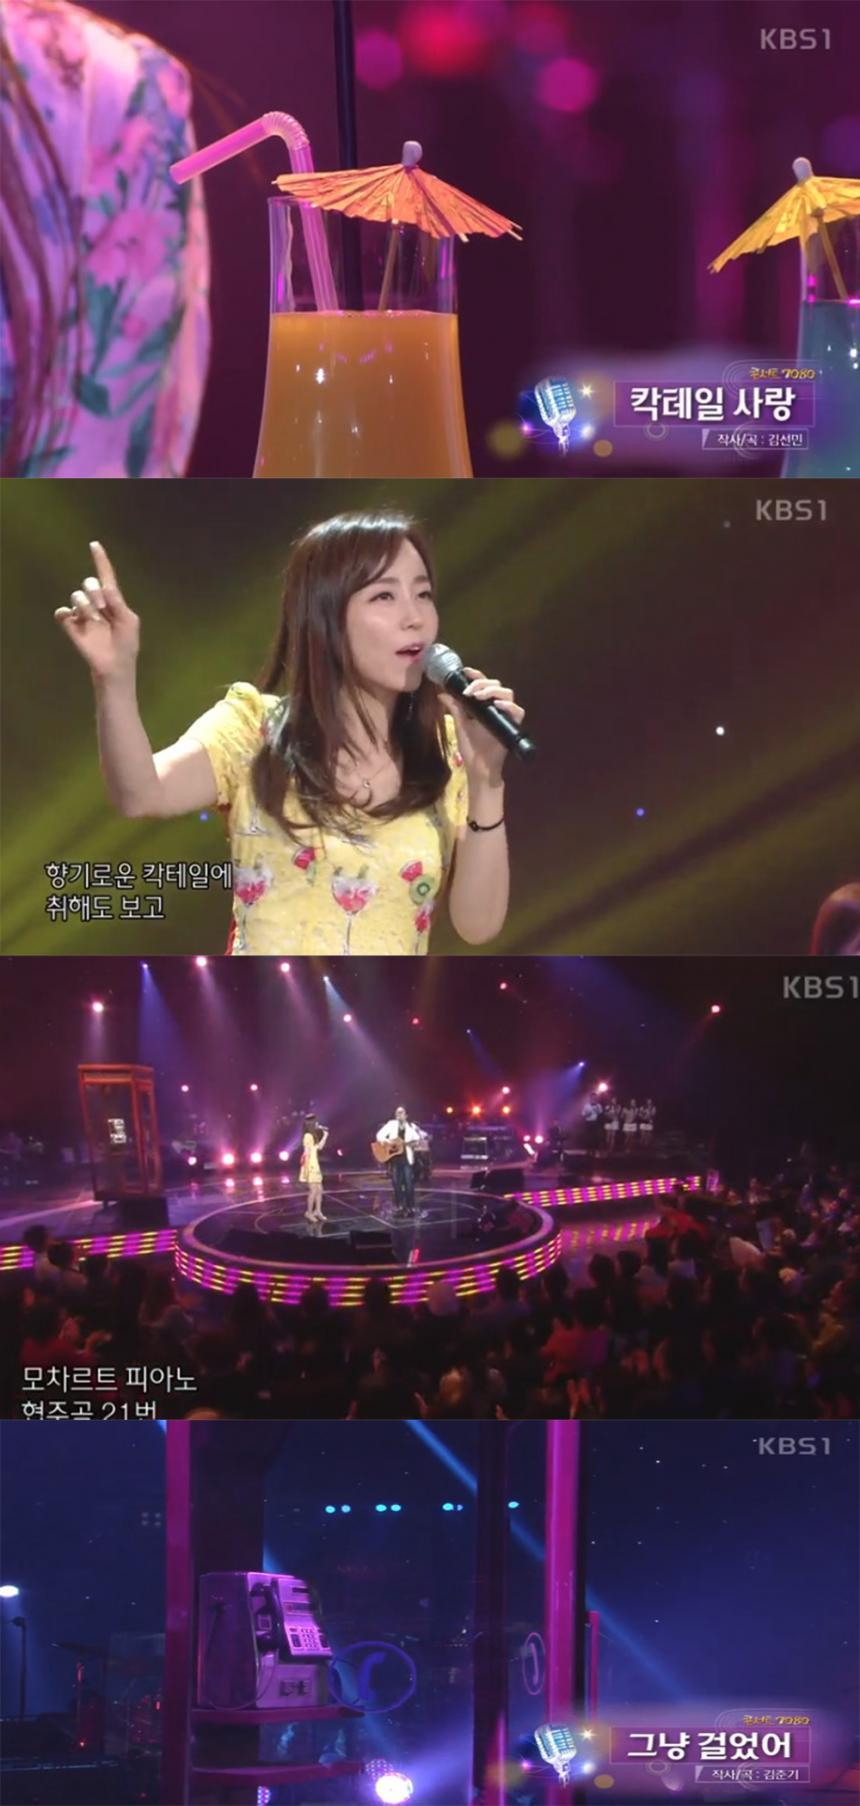 KBS '콘서트7080' 방송 캡처